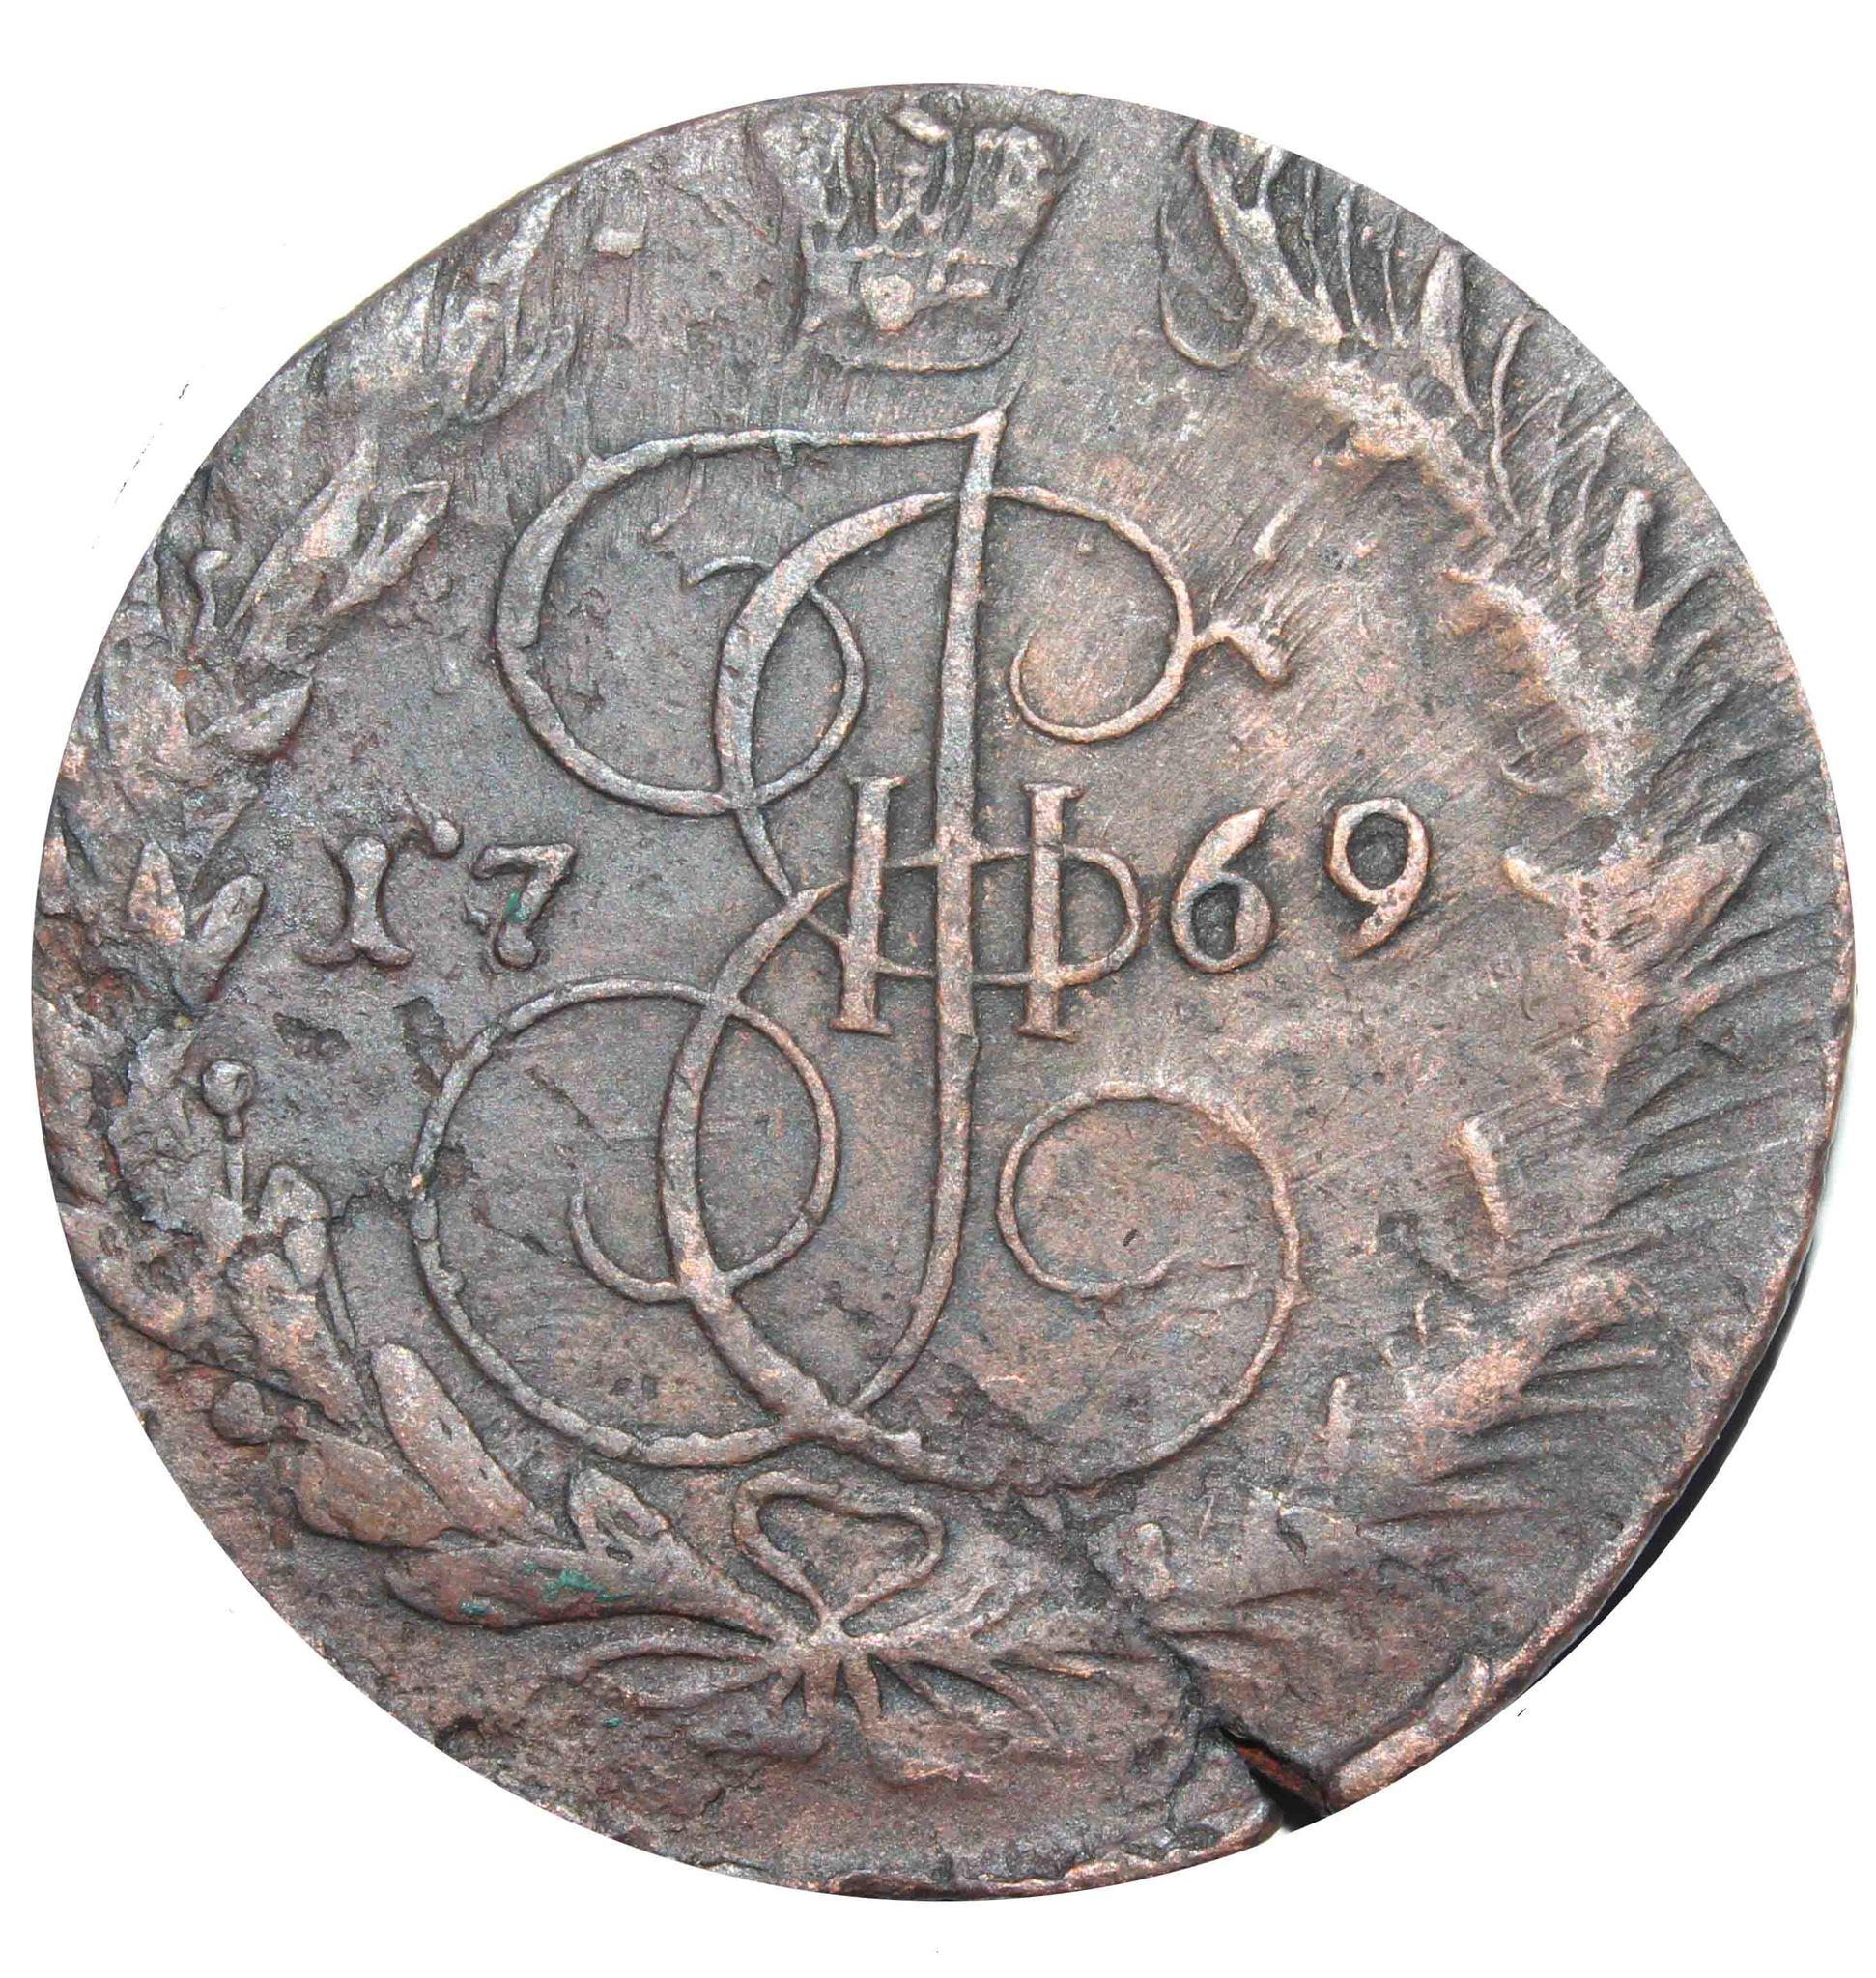 5 копеек. Екатерина II. ЕМ. 1769 г. F-VF